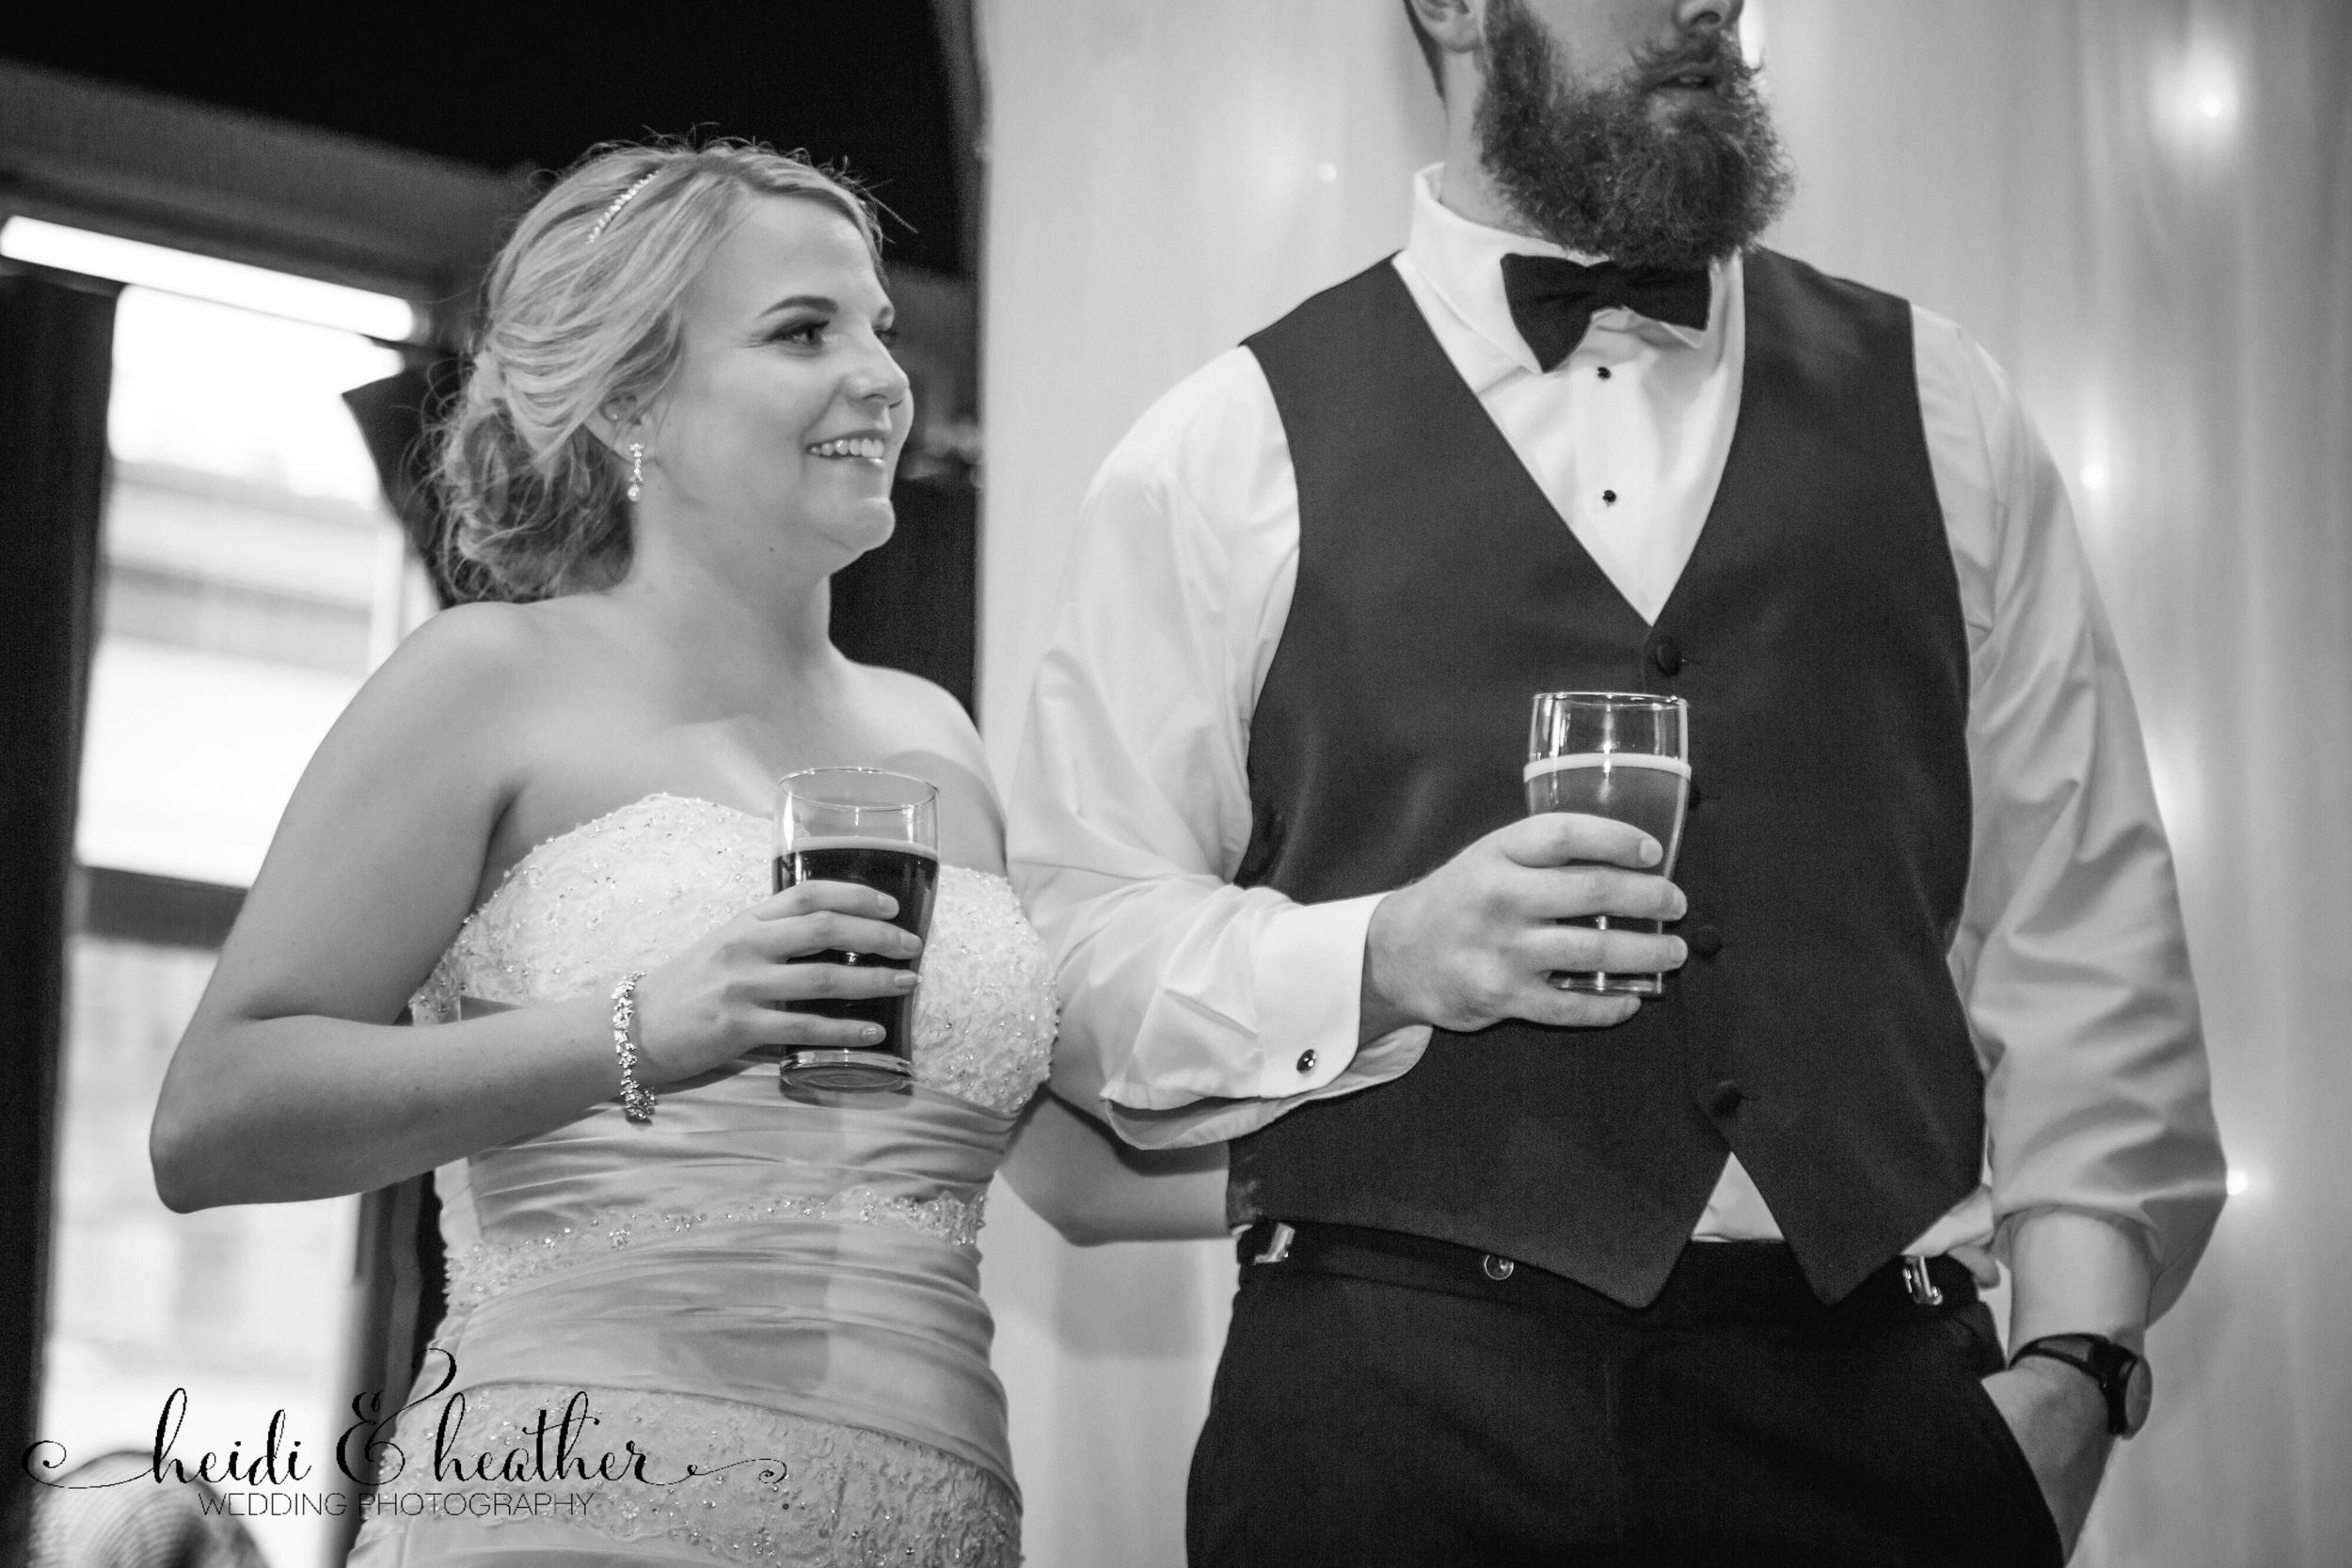 Toasting to the bride and groom at McMenamins Crystal Ballroom.